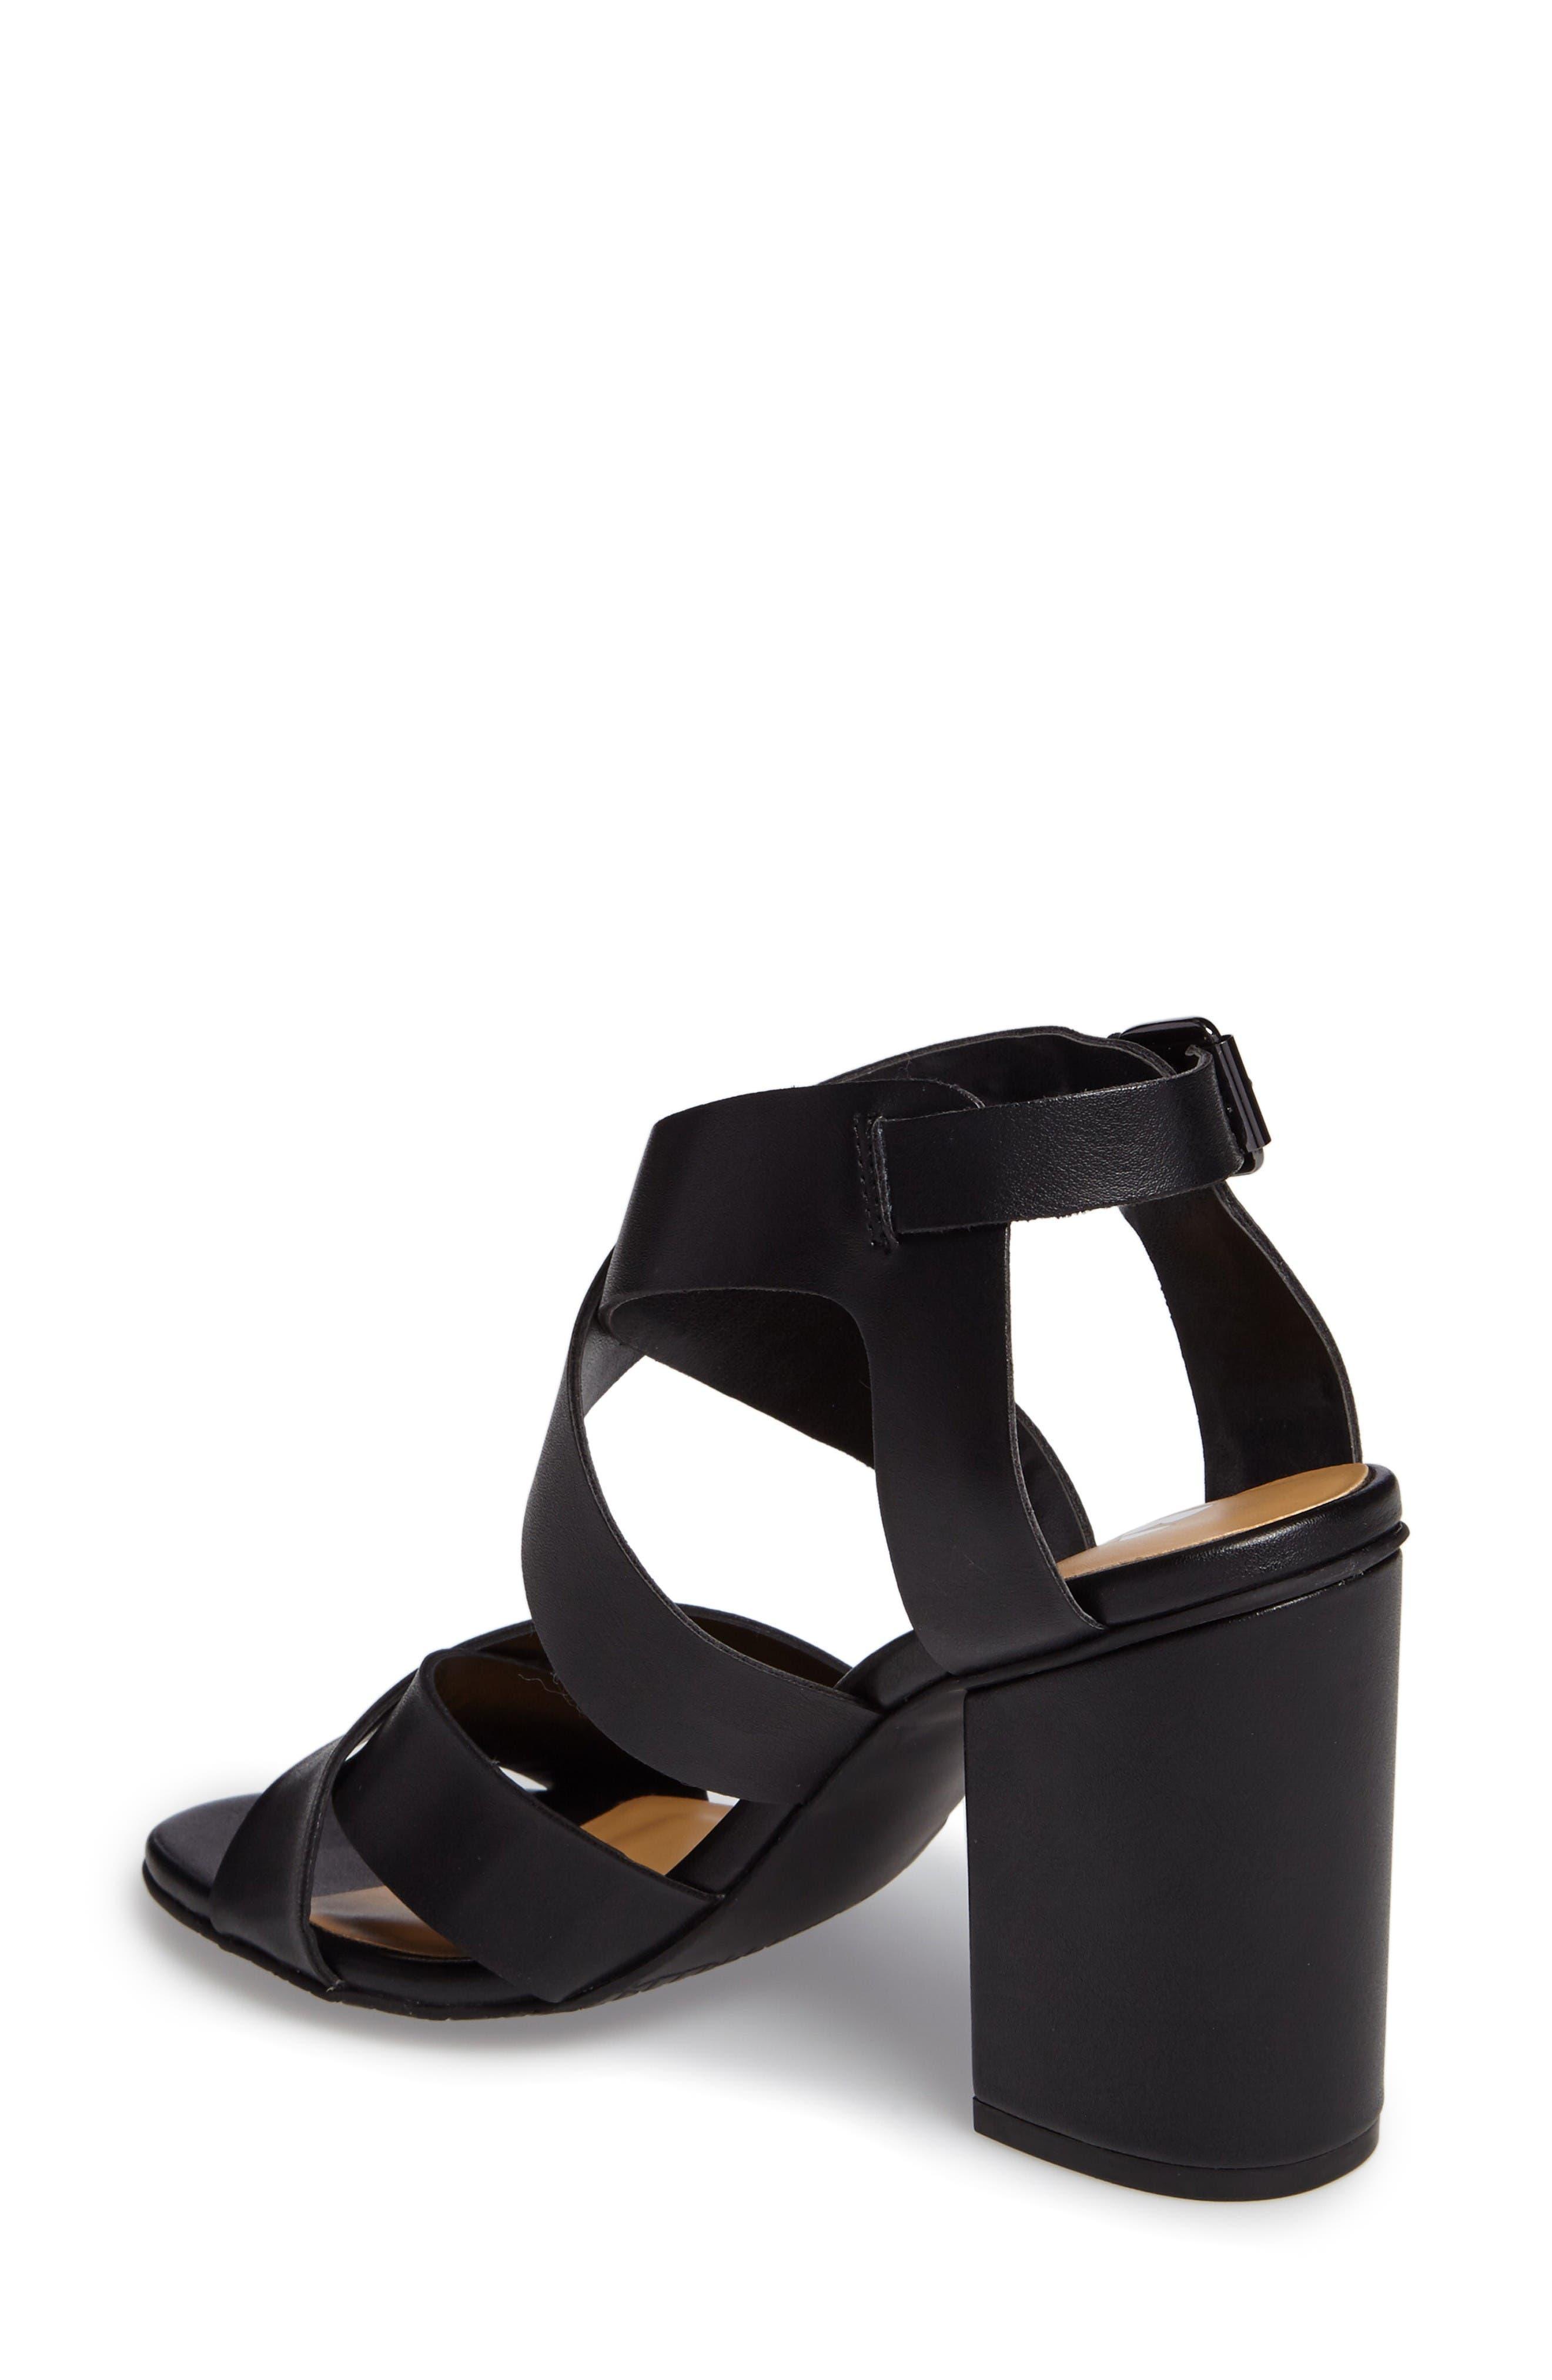 Terry Block Heel Sandal,                             Alternate thumbnail 2, color,                             Black Faux Leather